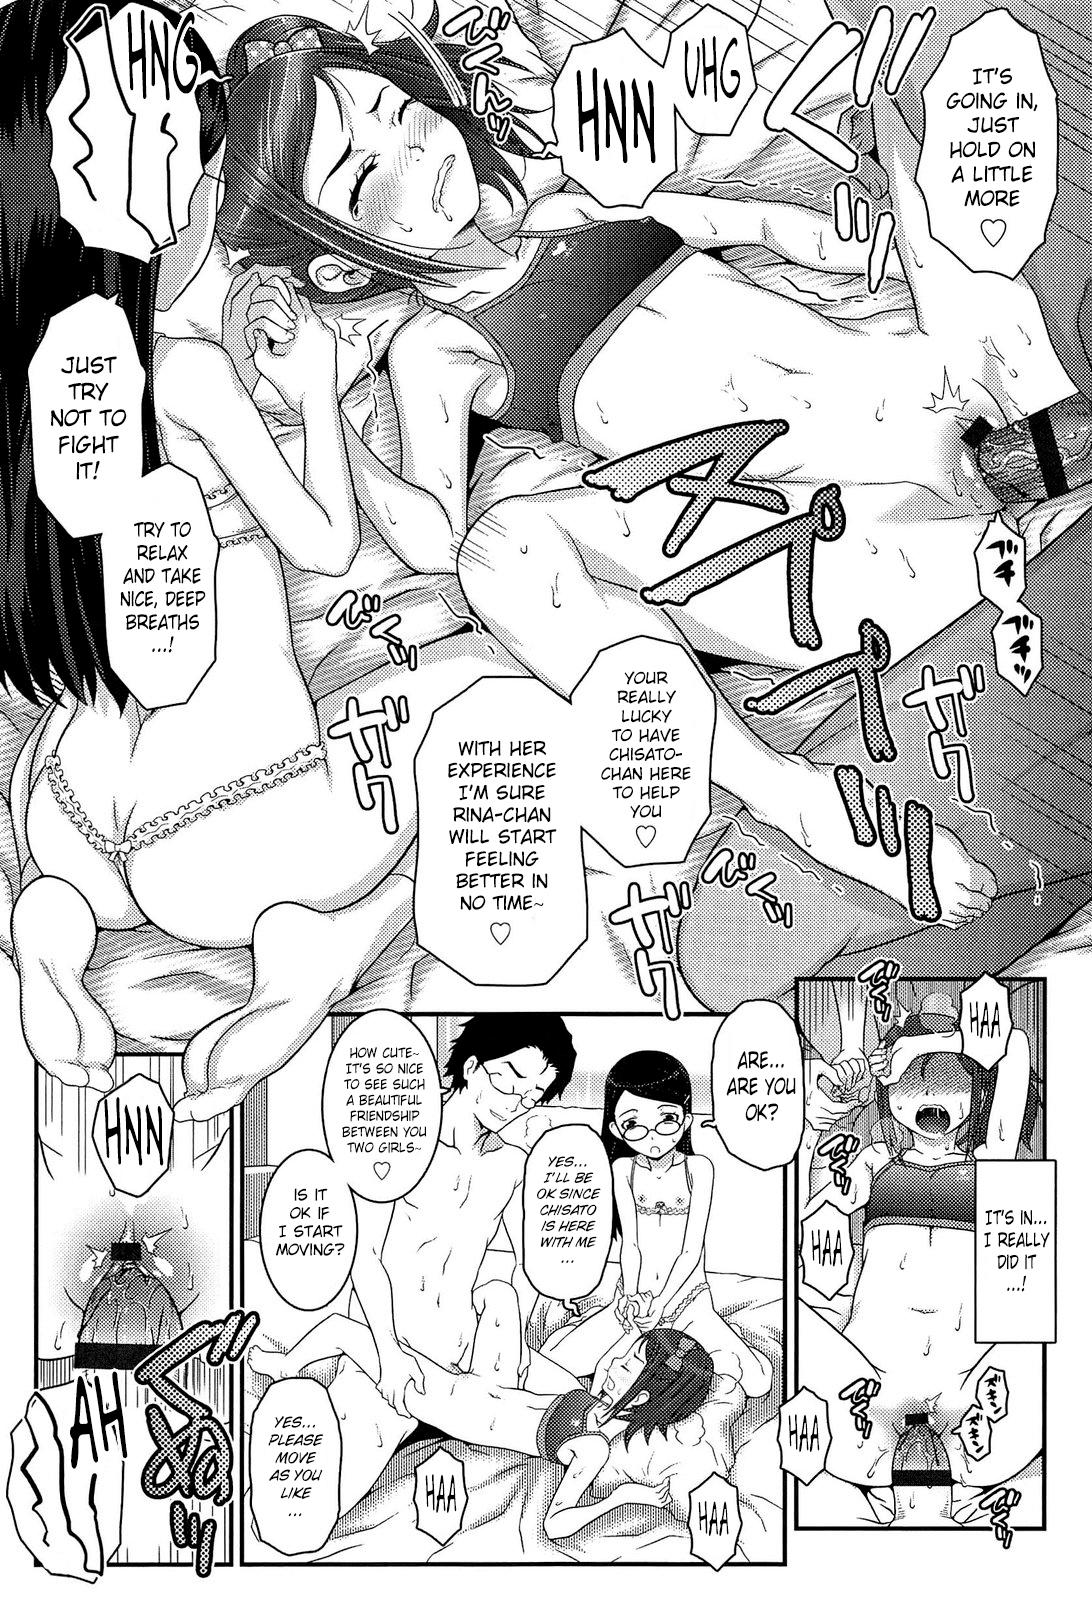 Kanojo-tachi no Kankei + Sonogo   Their Relationship + After Story 16